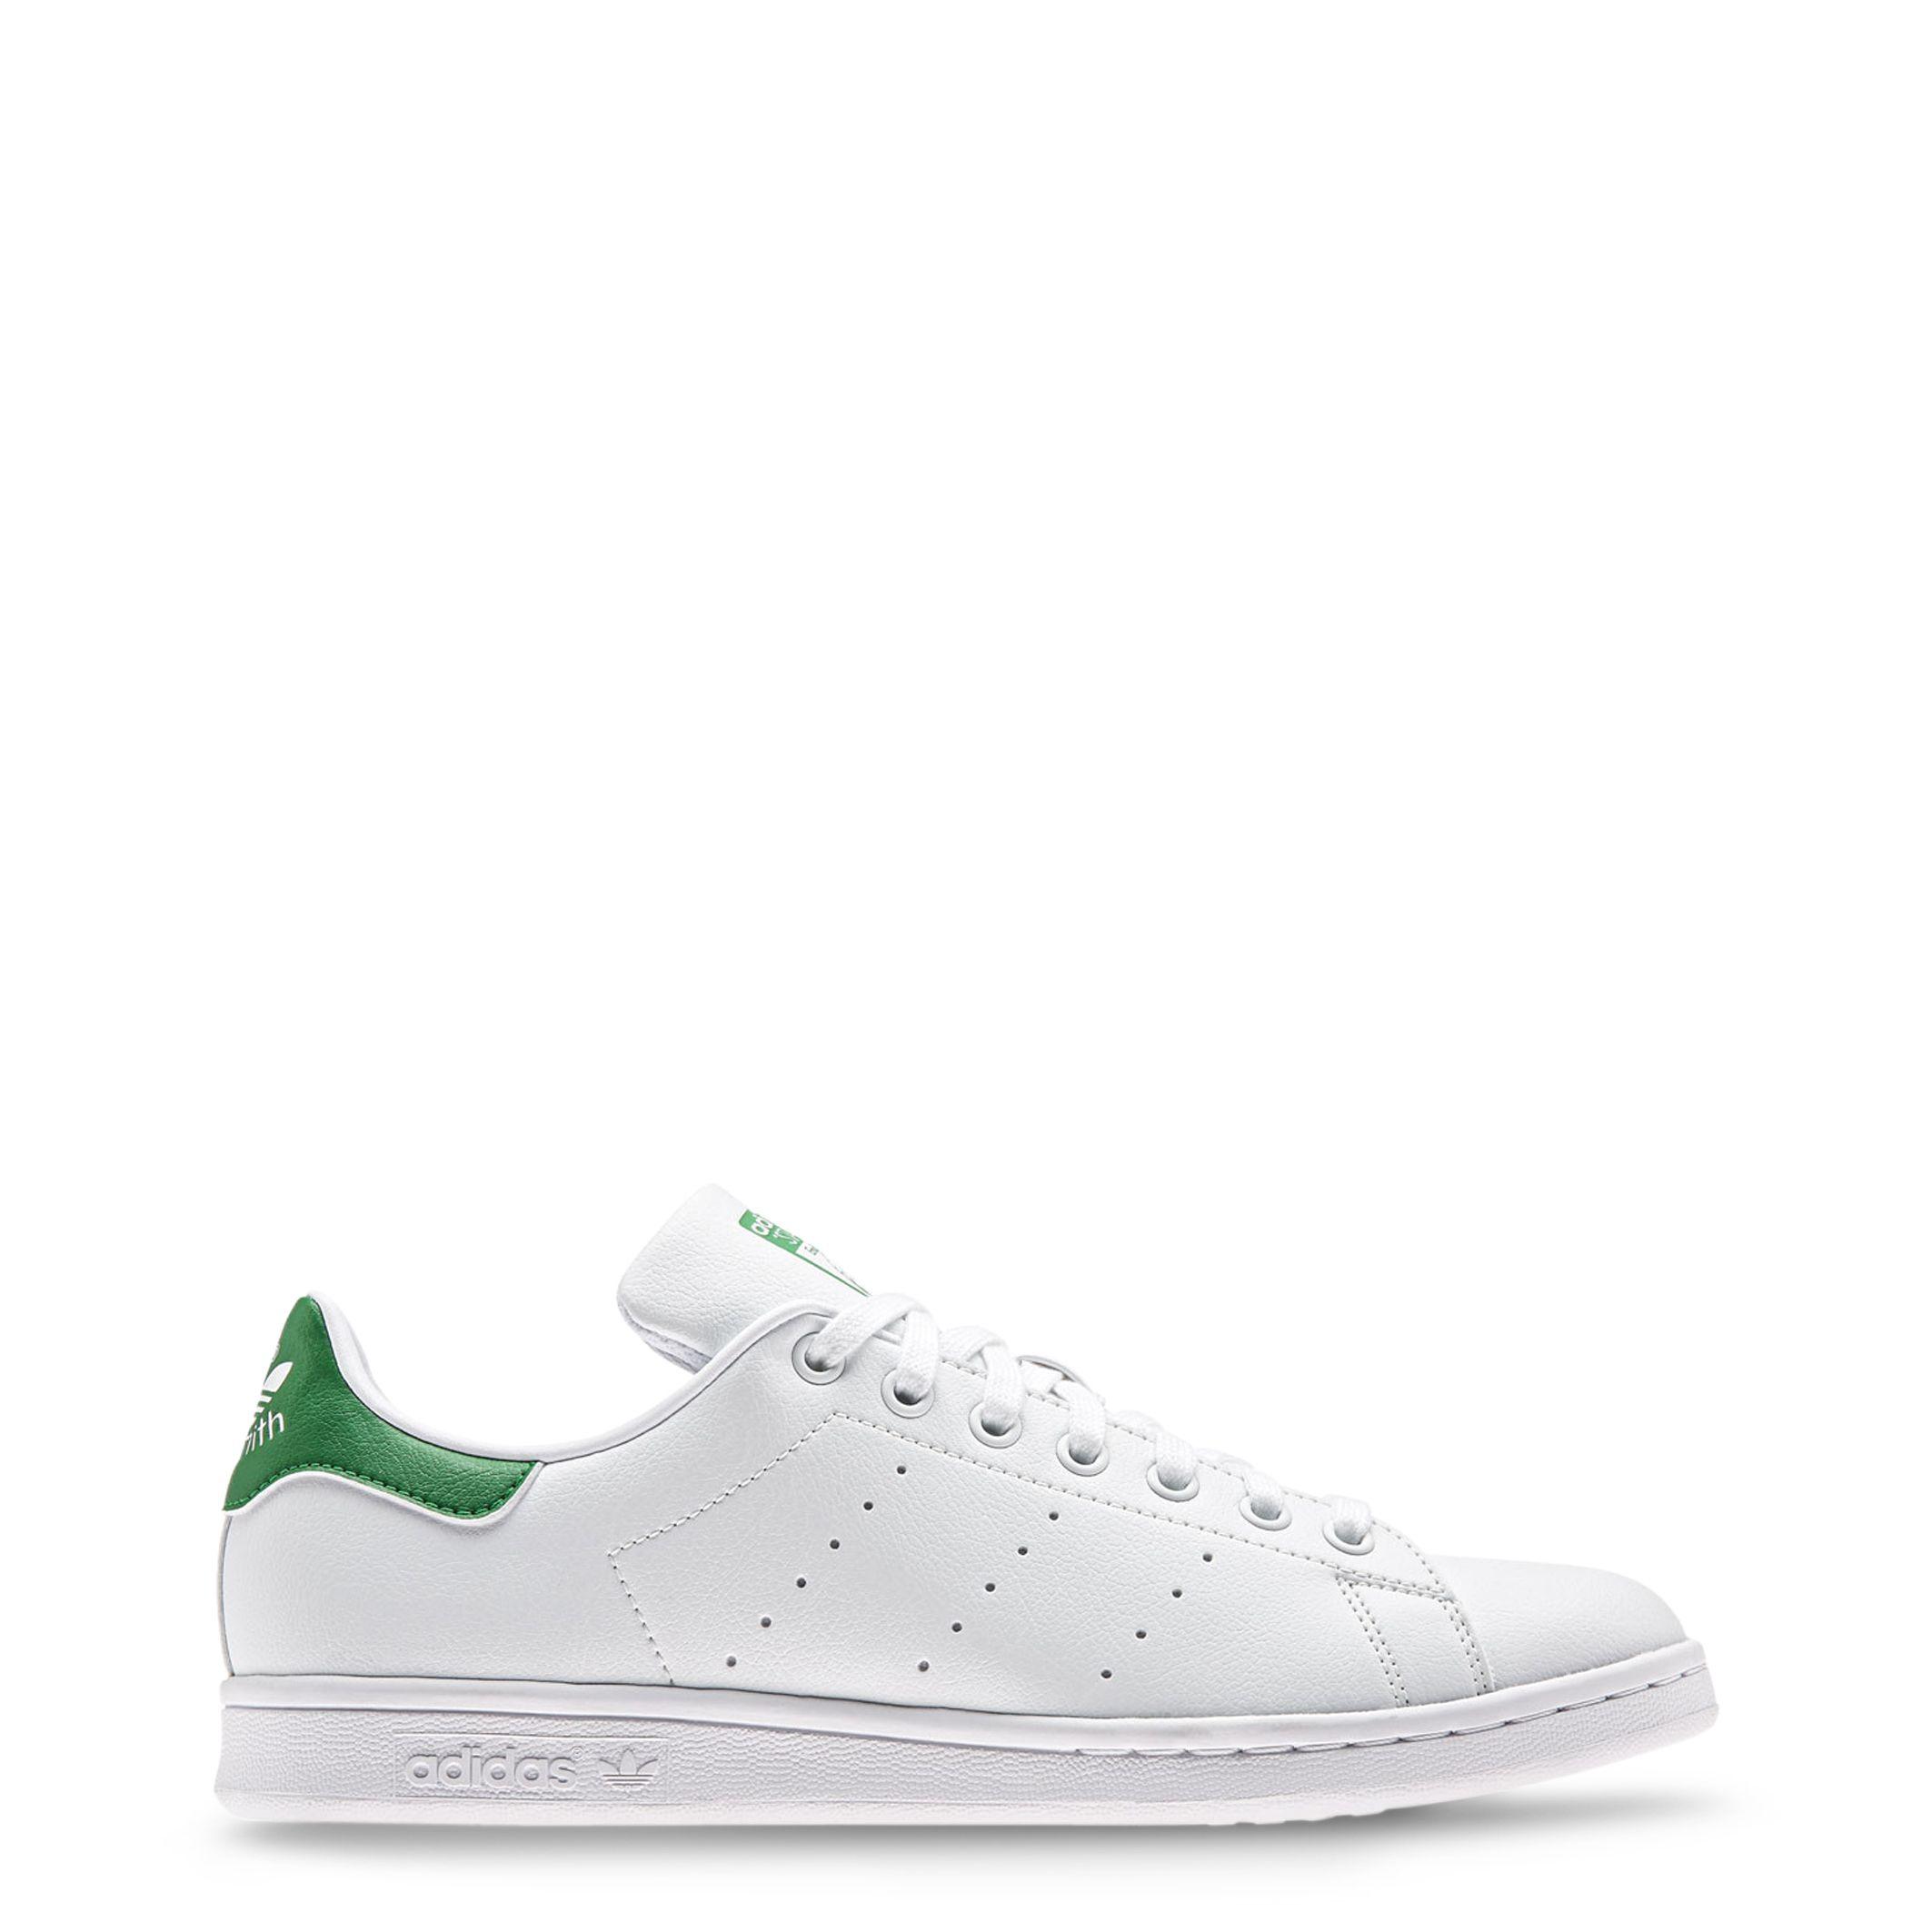 Adidas – StanSmith – Blanco